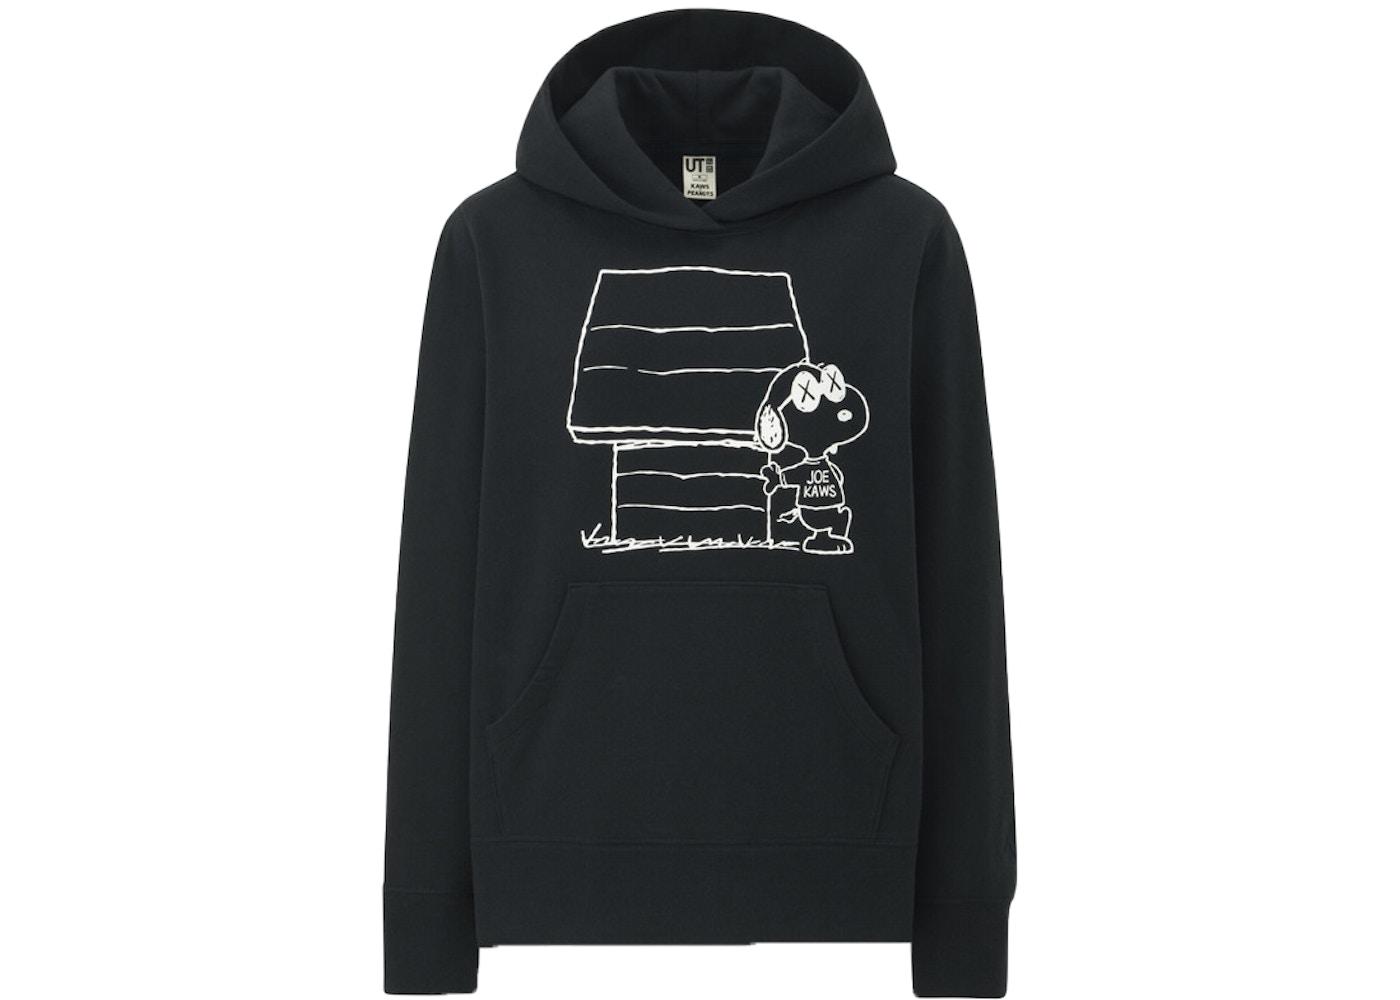 shopping price remains stable speical offer KAWS x Uniqlo x Peanuts Joe Kaws Doghouse Hoodie (US Womens Sizing) Black